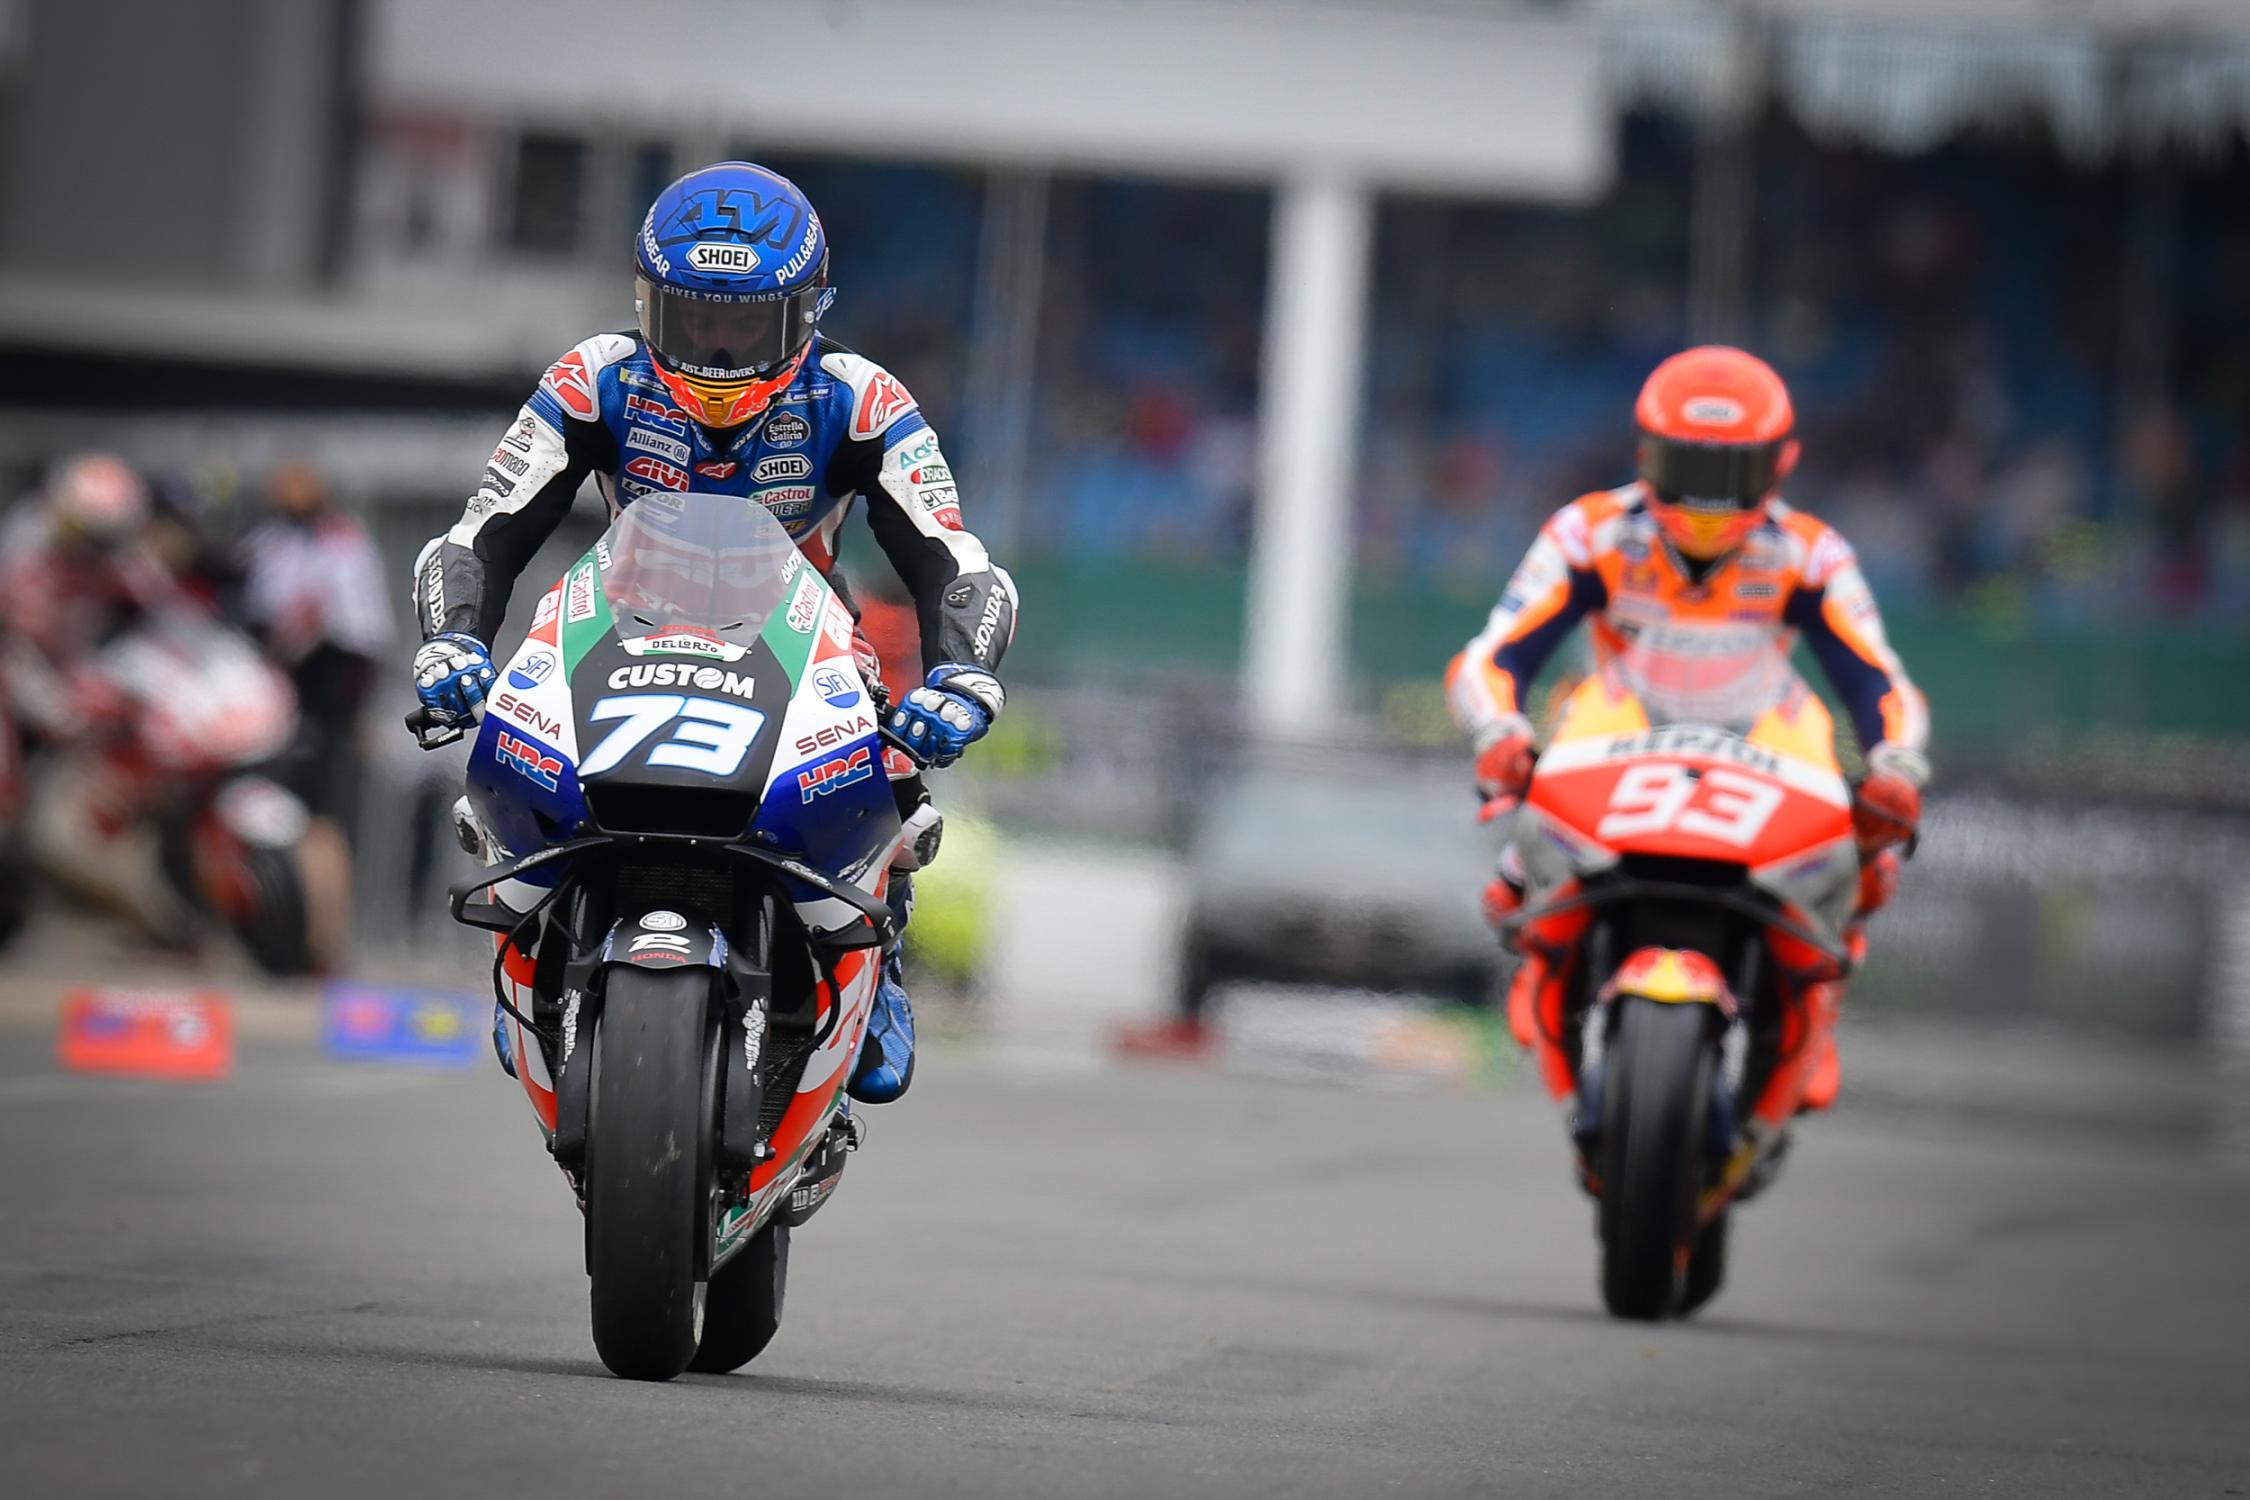 Alex Marquez, Marc Márquez, LCR Honda, Monster Energy British Grand Prix